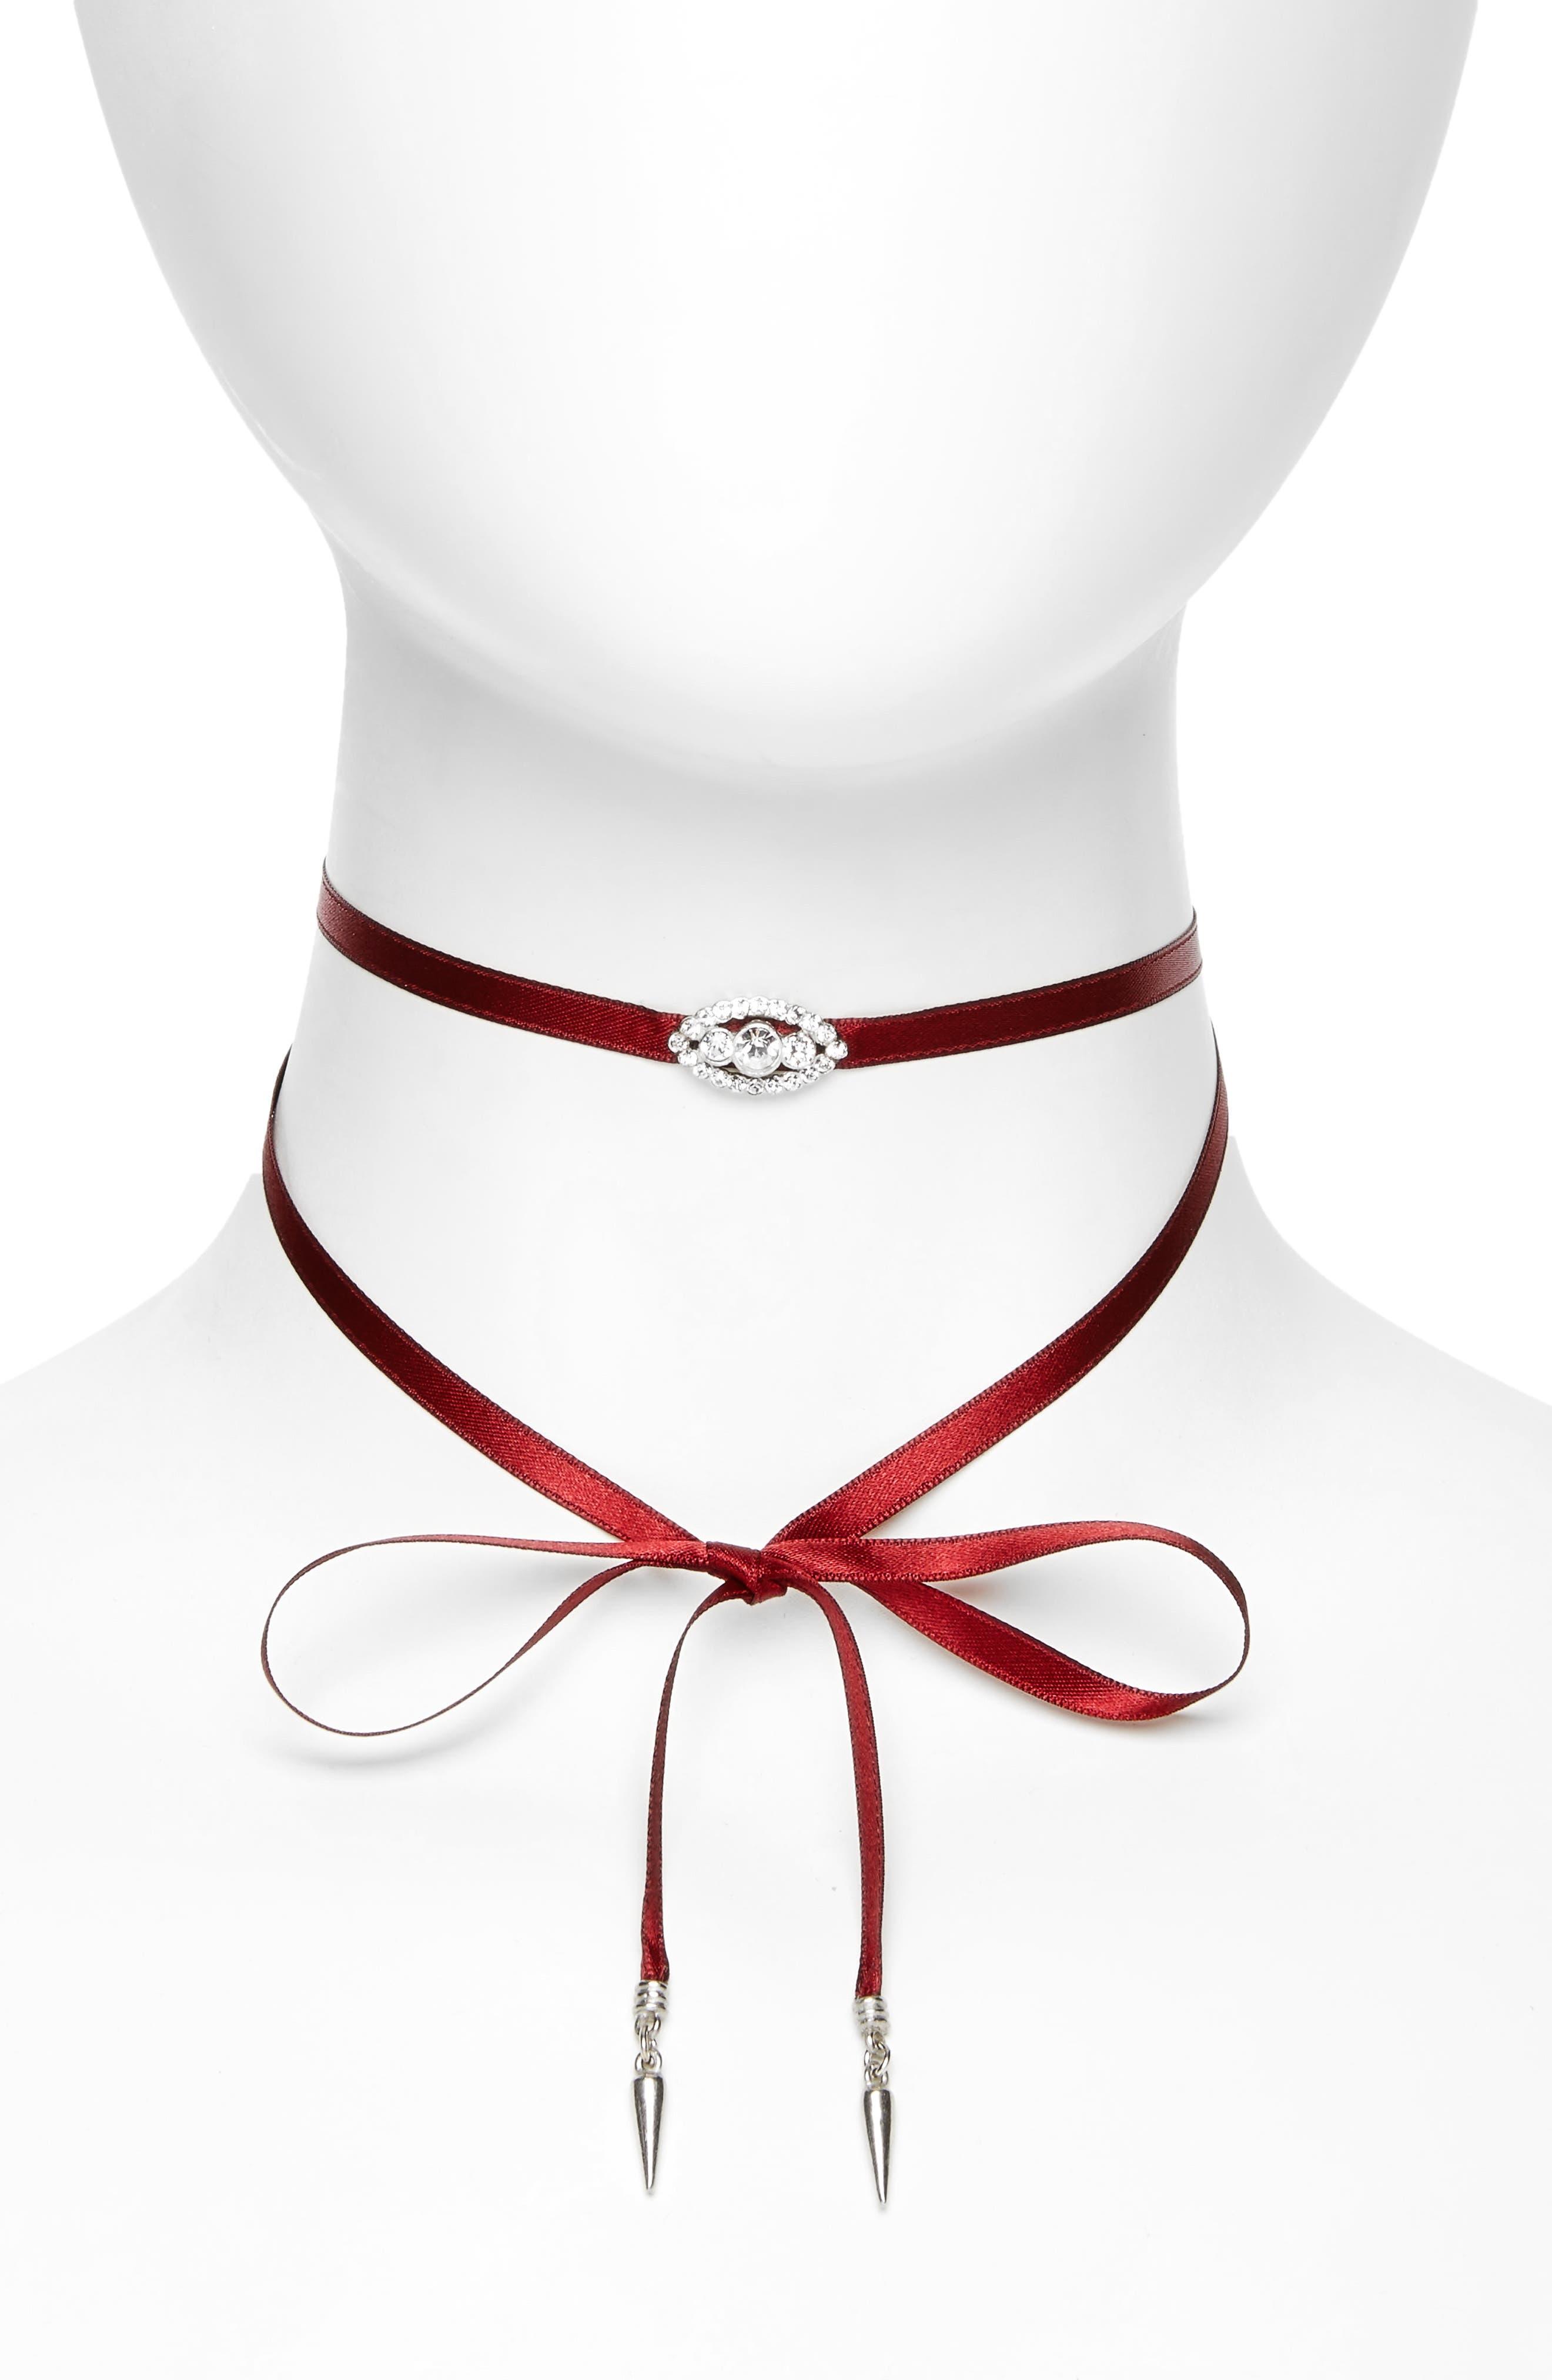 Main Image - Ben-Amun Wrap Choker Necklace